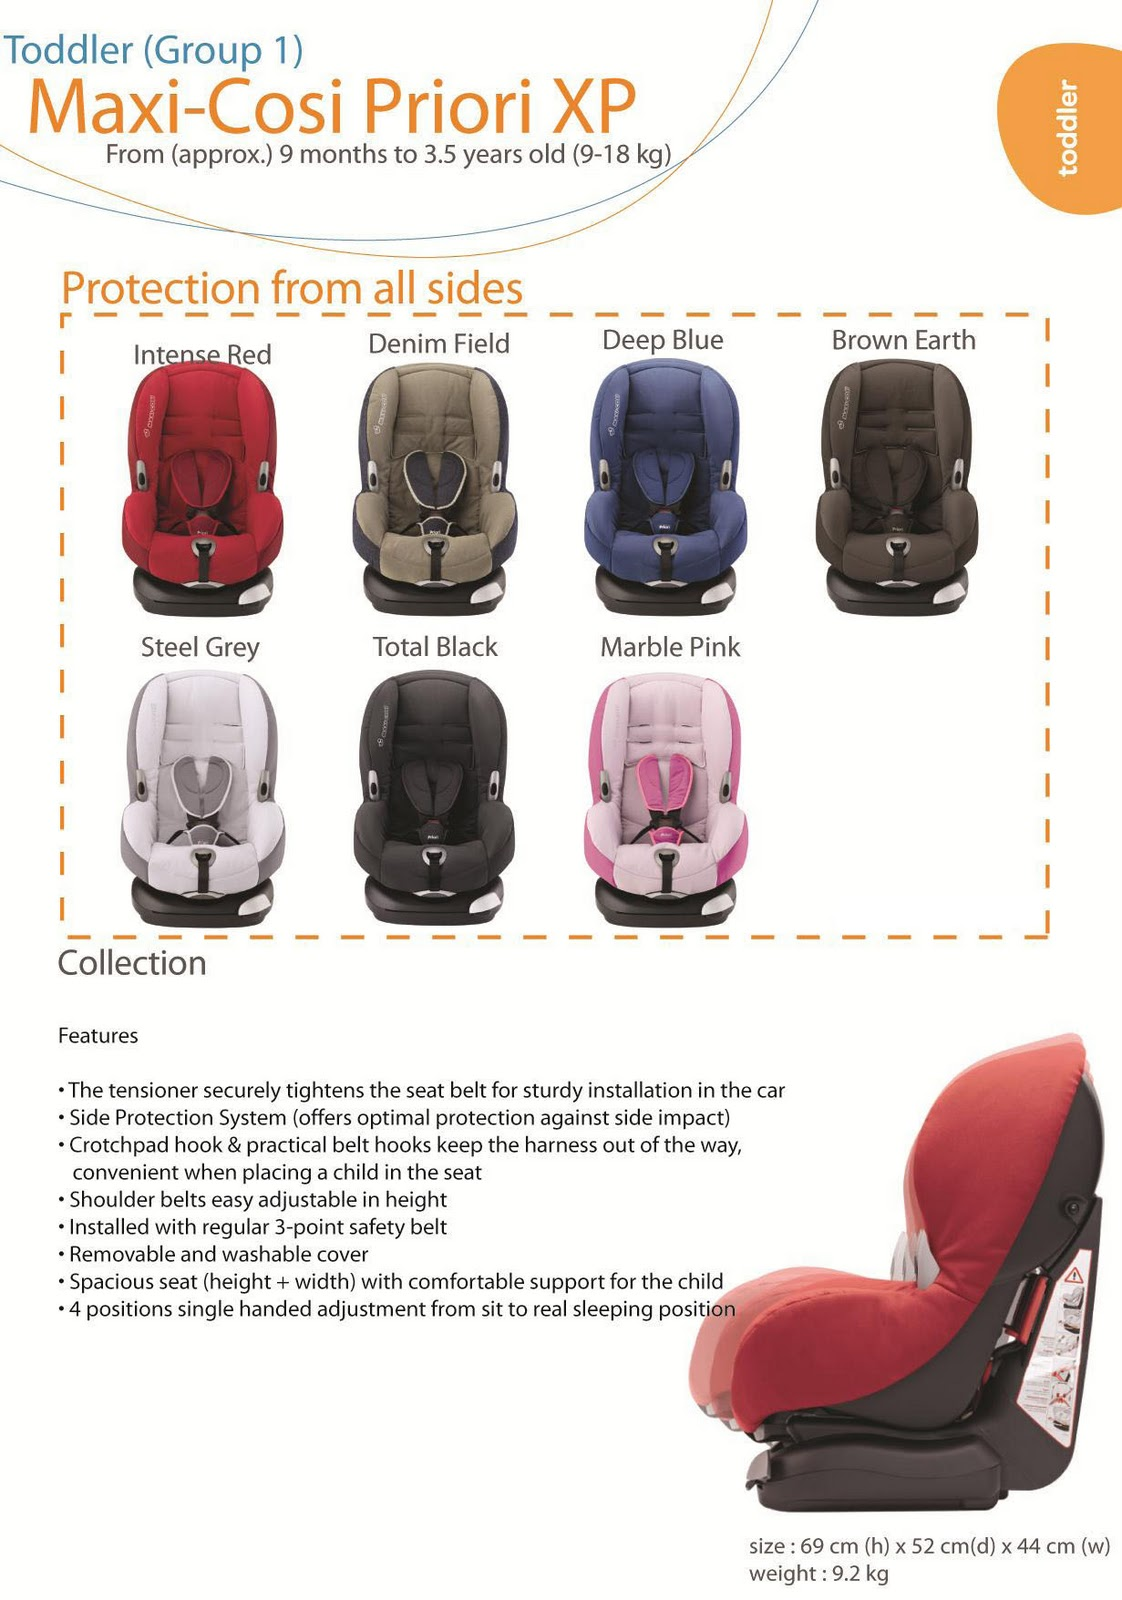 qbabies online store car seat. Black Bedroom Furniture Sets. Home Design Ideas